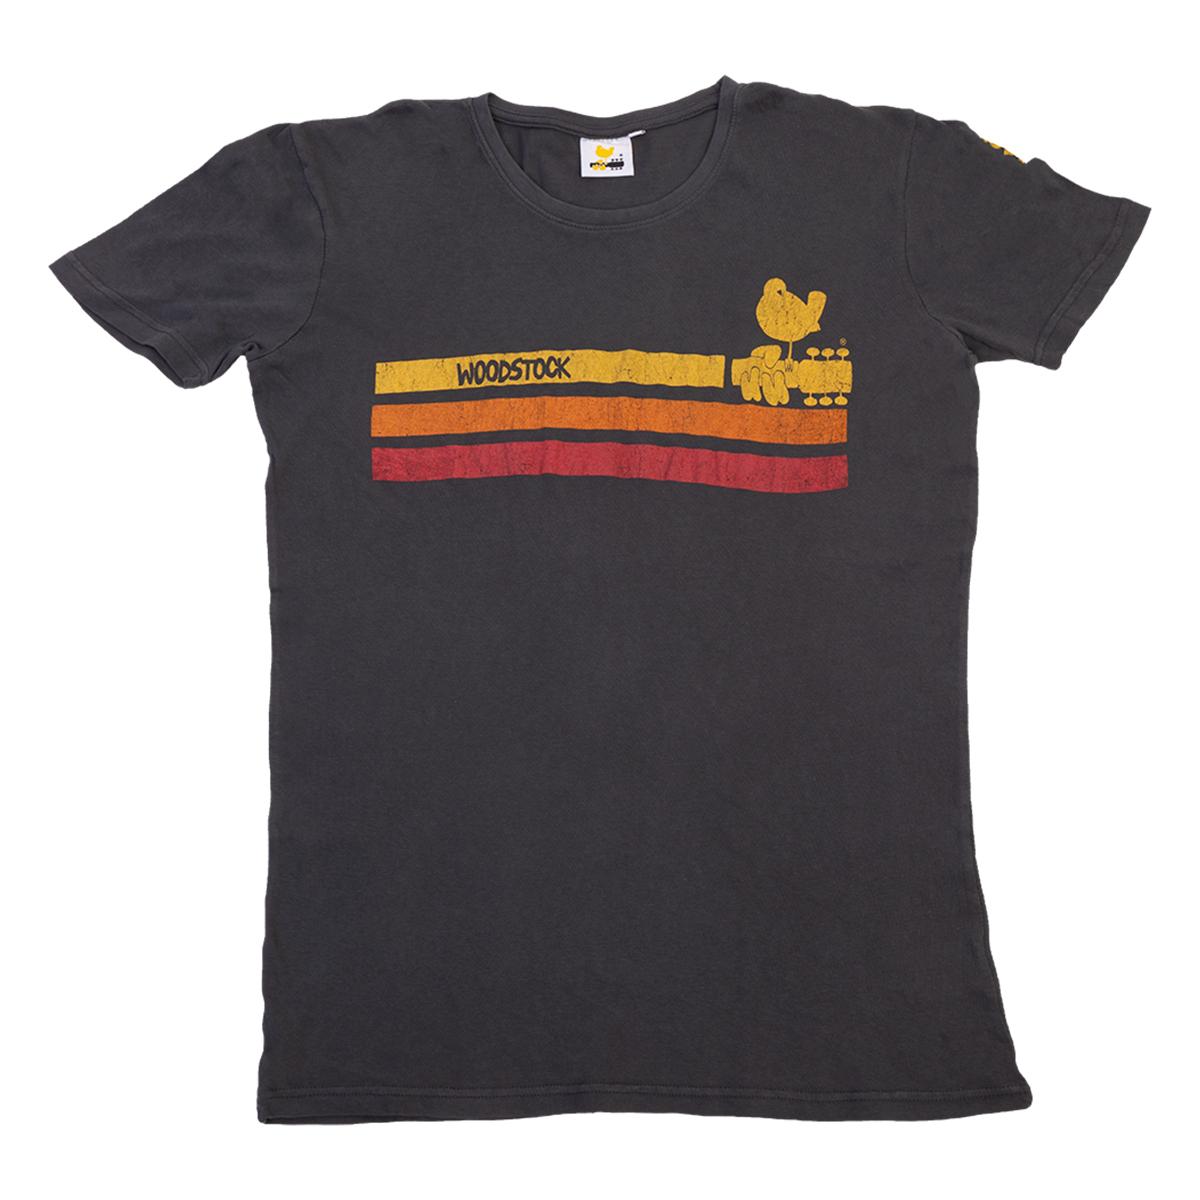 Woodstock Grey T-shirt